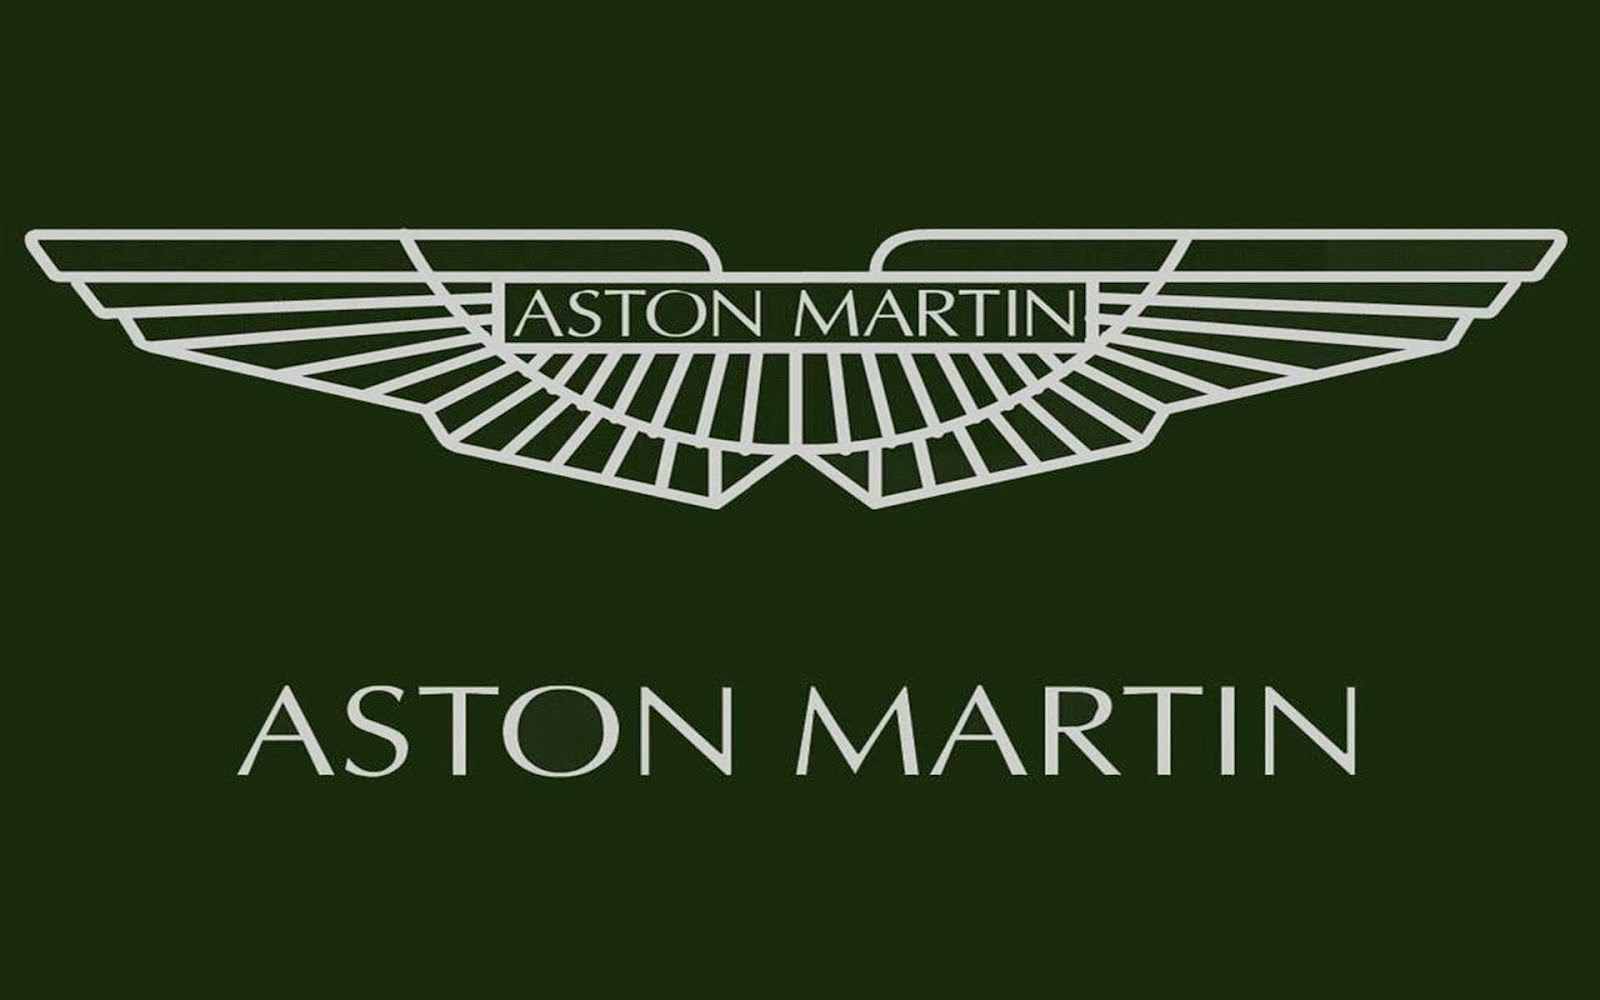 aston martin free logo pictures hds. Black Bedroom Furniture Sets. Home Design Ideas